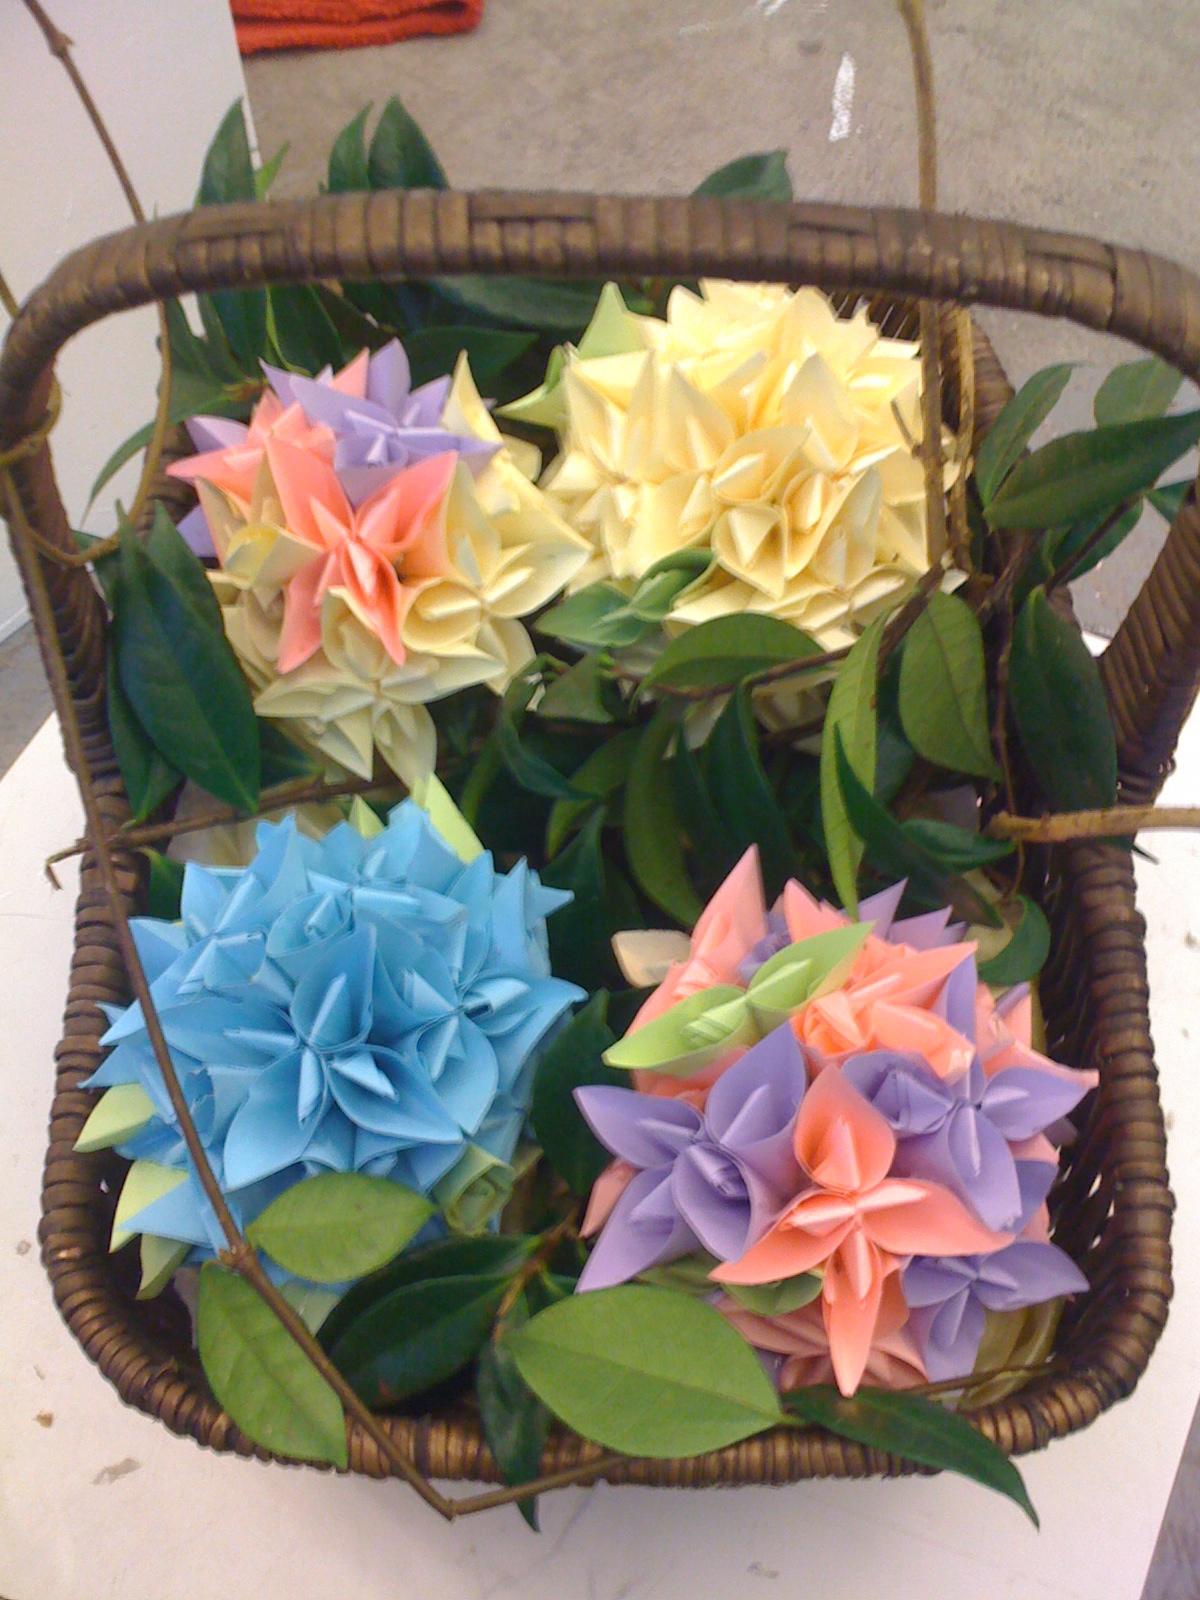 ThreeDeeWinter2011: Post It Note Orgami Flowers - photo#18